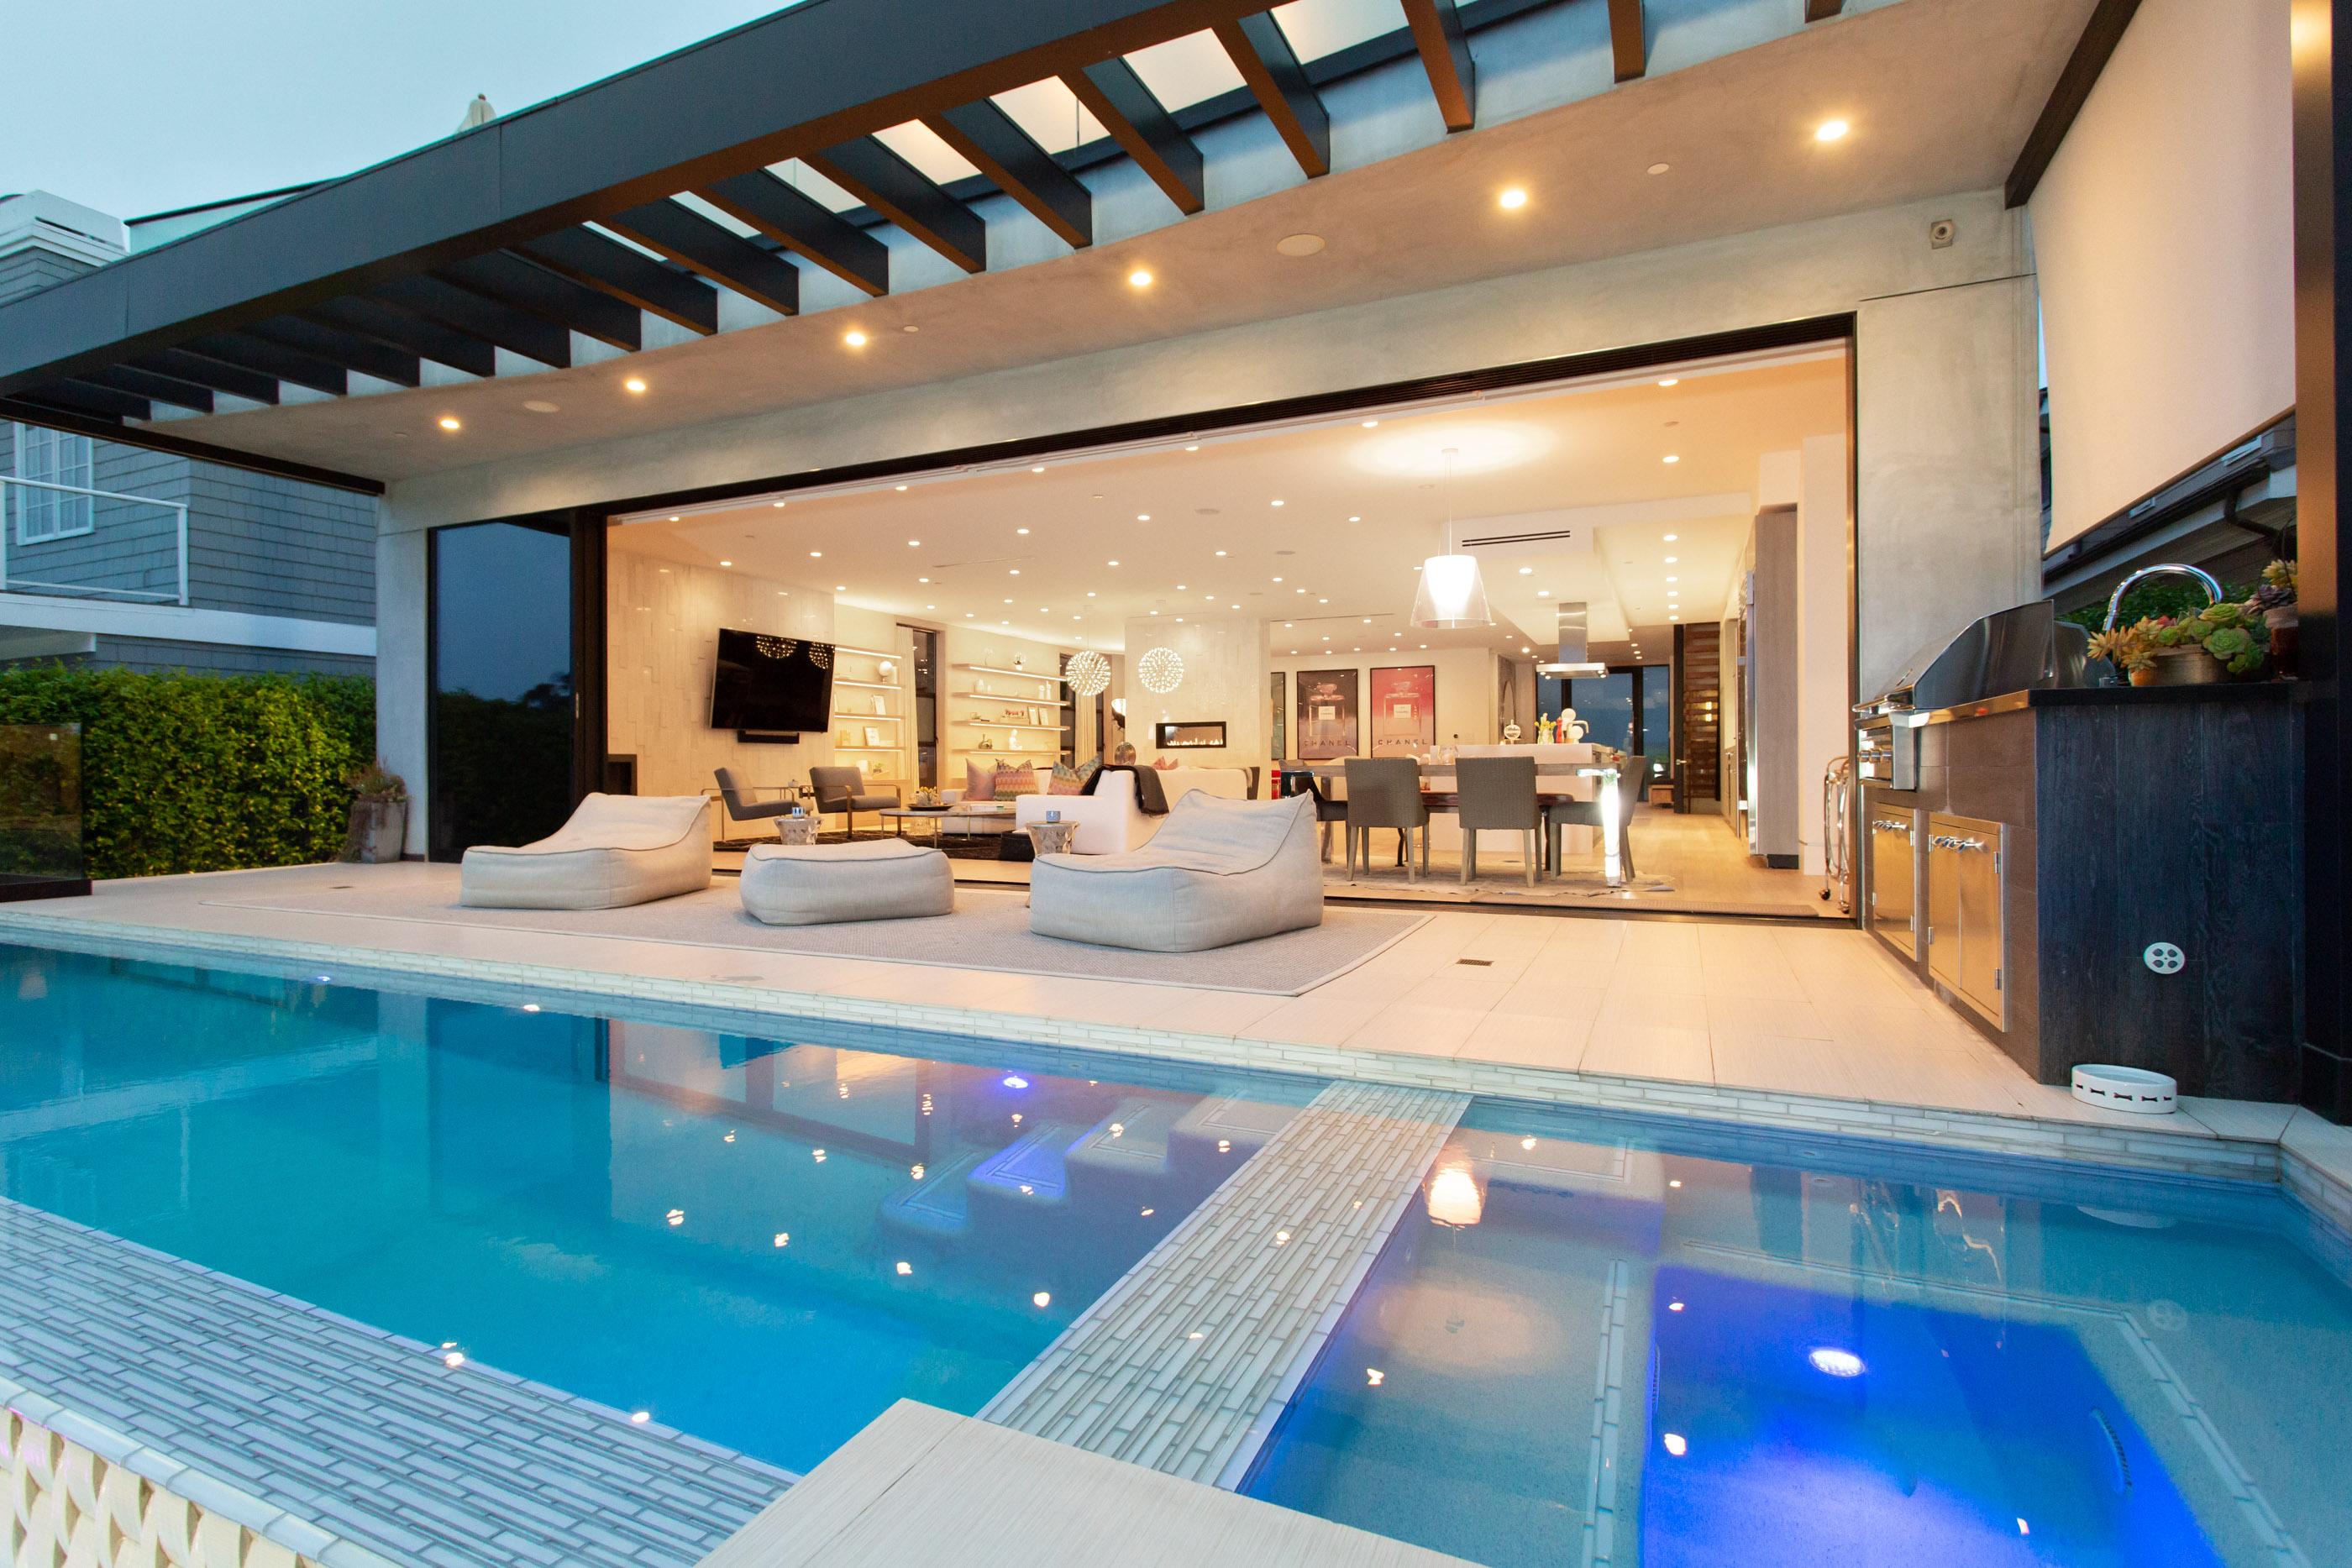 Giada De Laurentiis 7 Million Mansion Is The Perfect Place To Entertain